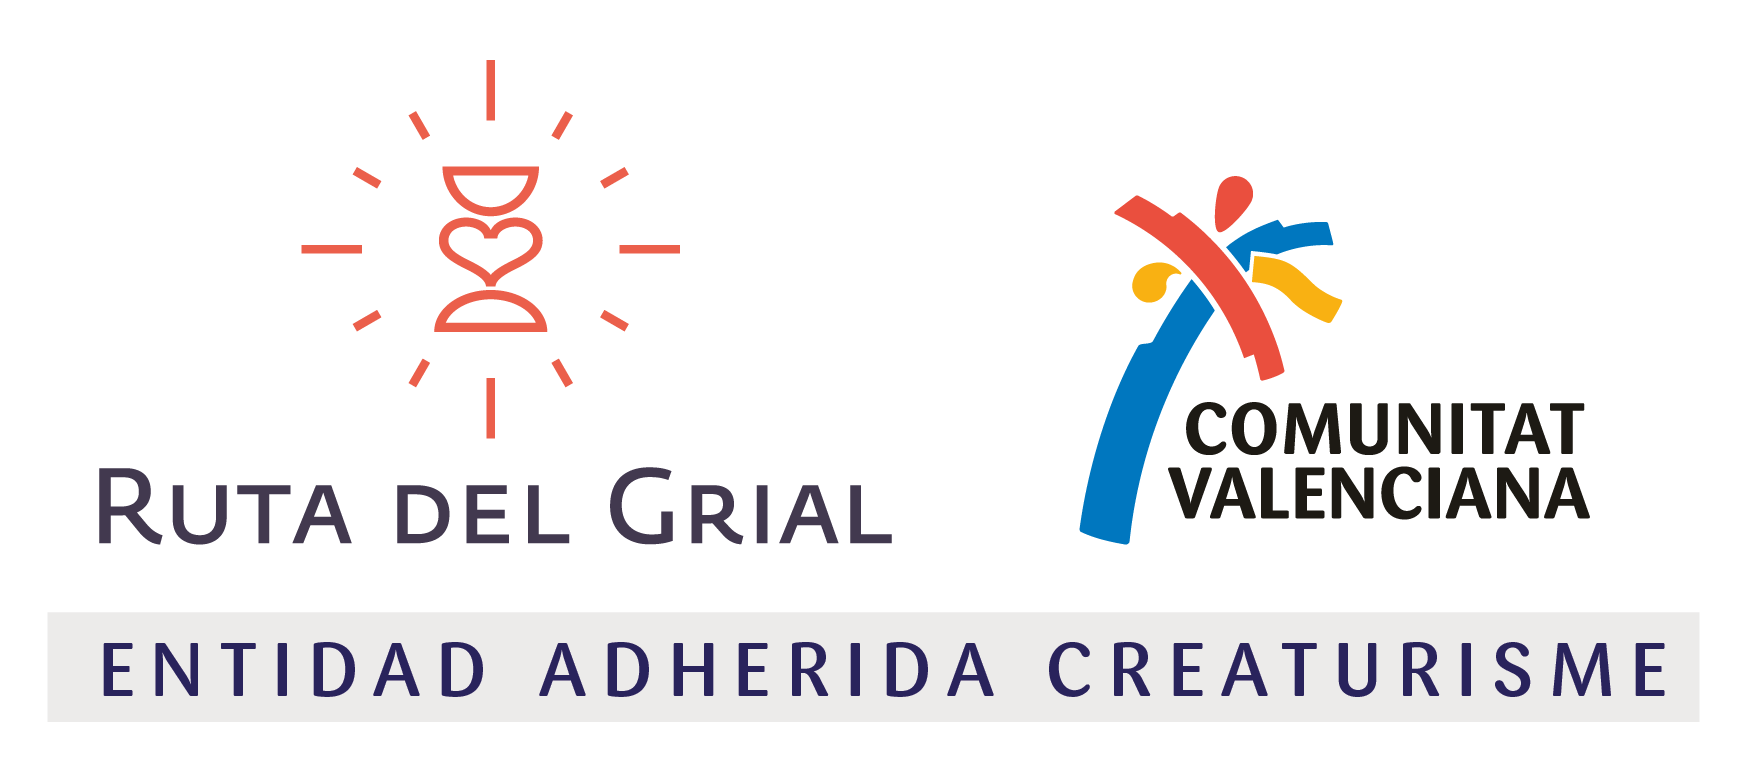 Empresa de Servicios Turísticos complementarios. NRV-129. Turisme Comunitat Valenciana.